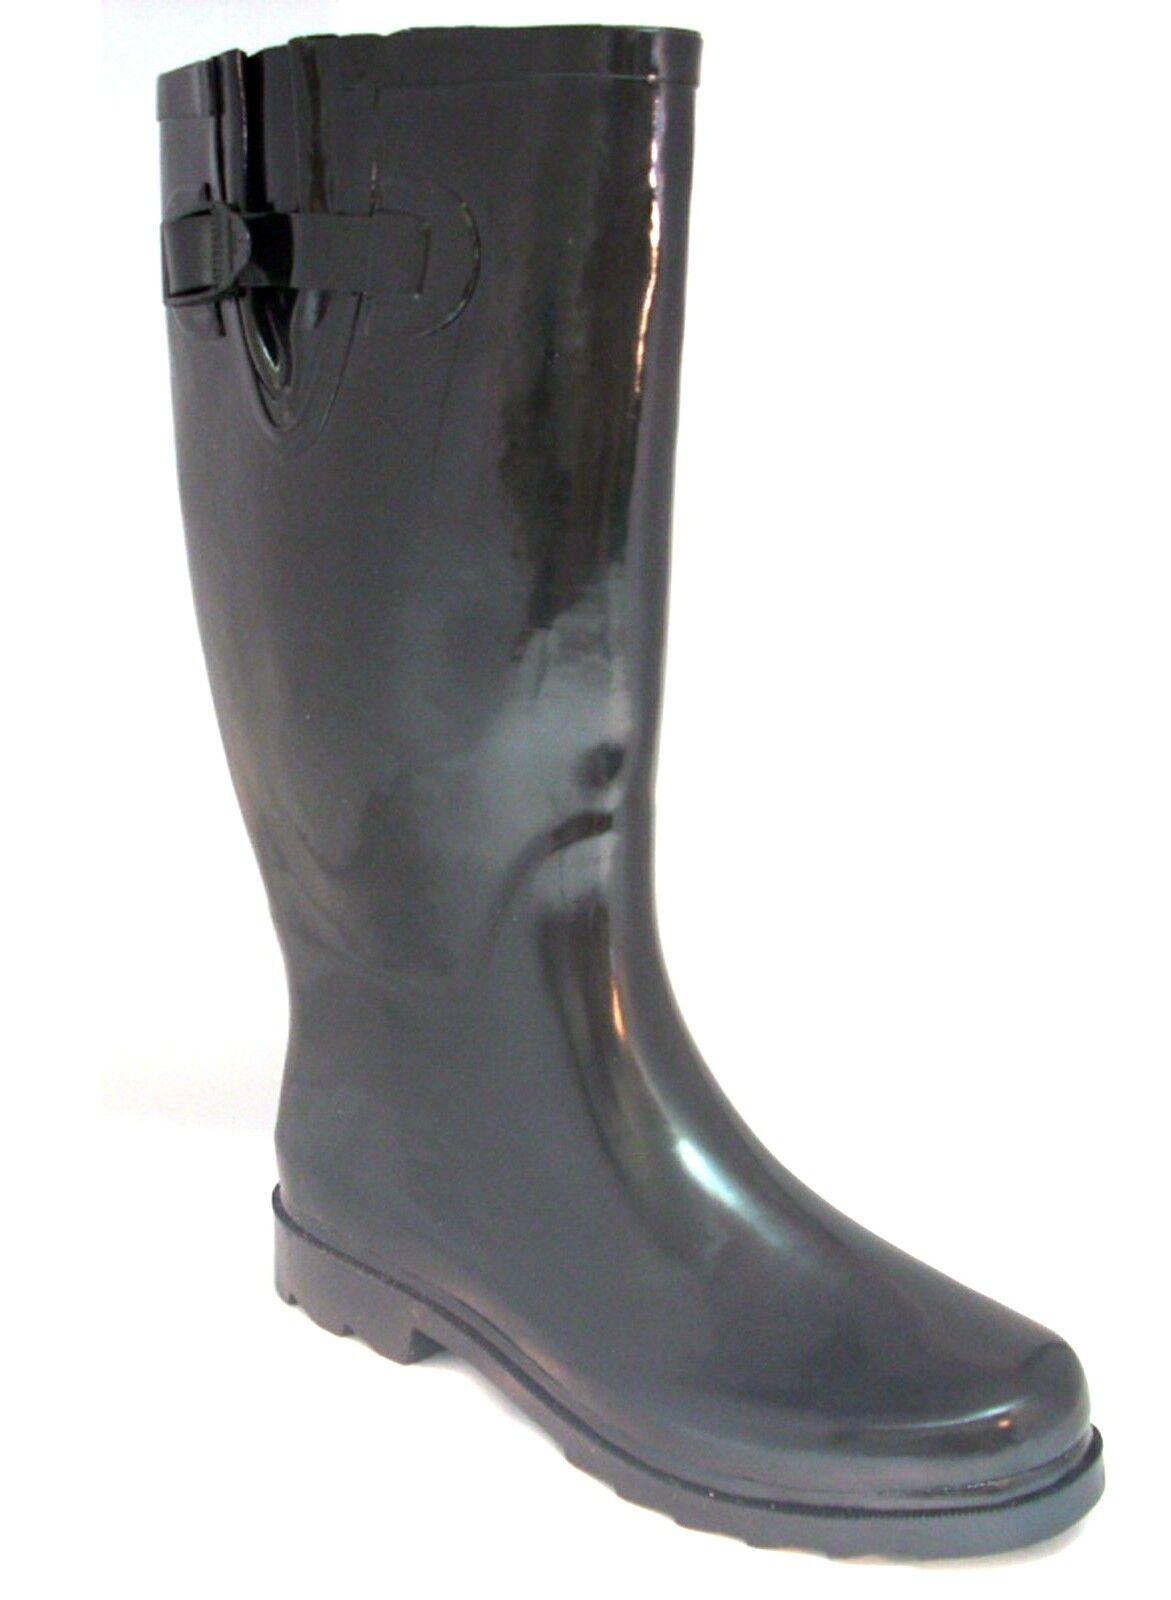 Rain Boots Size Womens Rubber New Wellies Snow 5 11 Mid Calf Flat 9 Women S 8 7